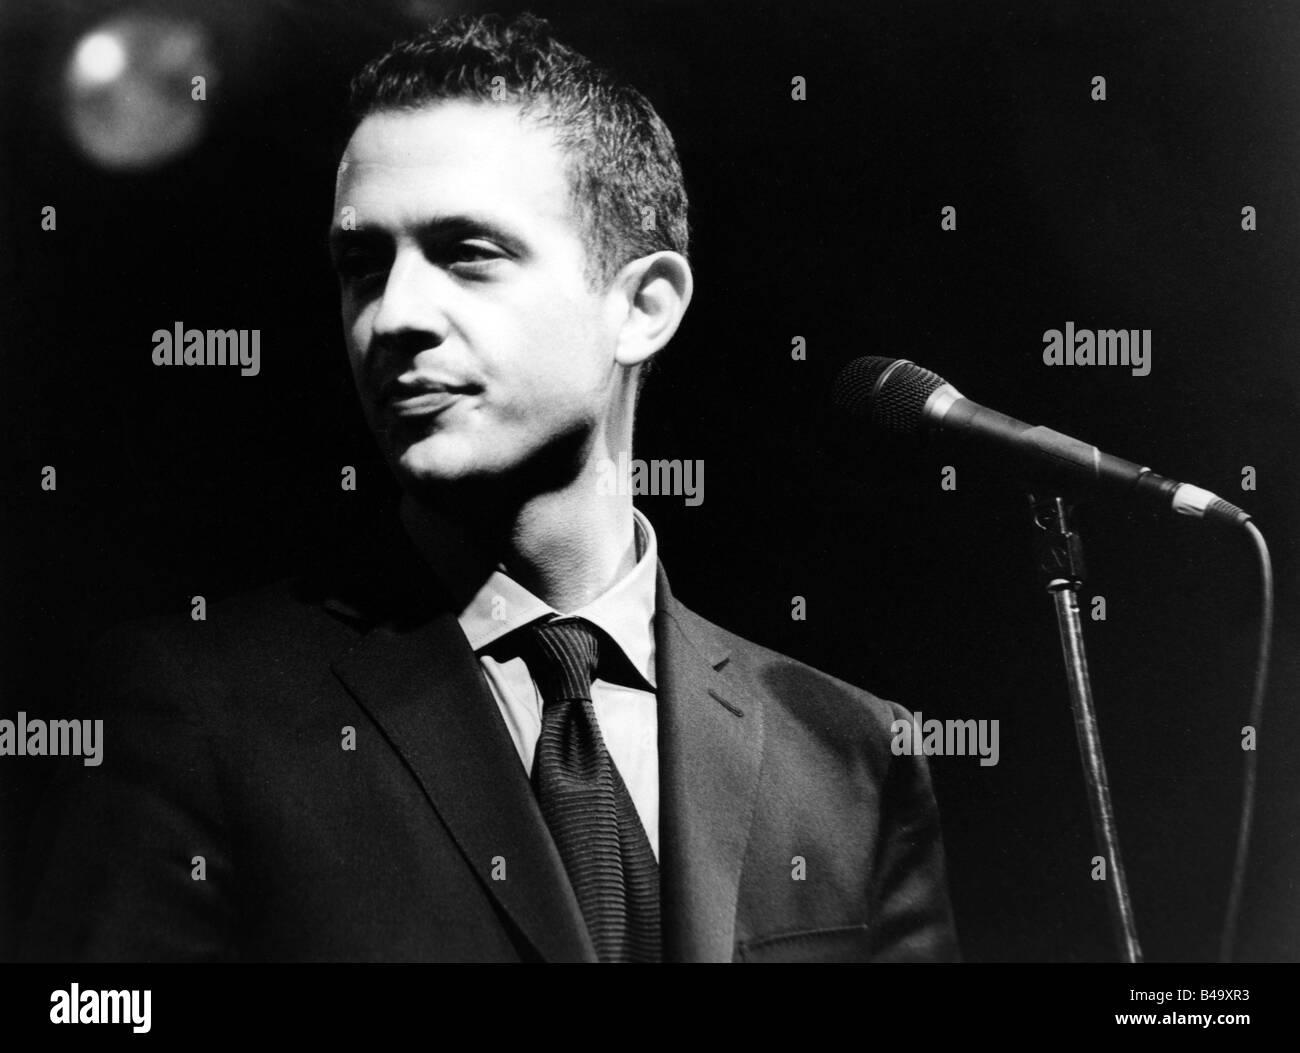 Brönner, Till, * 1971, German musician (Jazz), portrait, live performance, Mannheim, March 1999, Additional - Stock Image